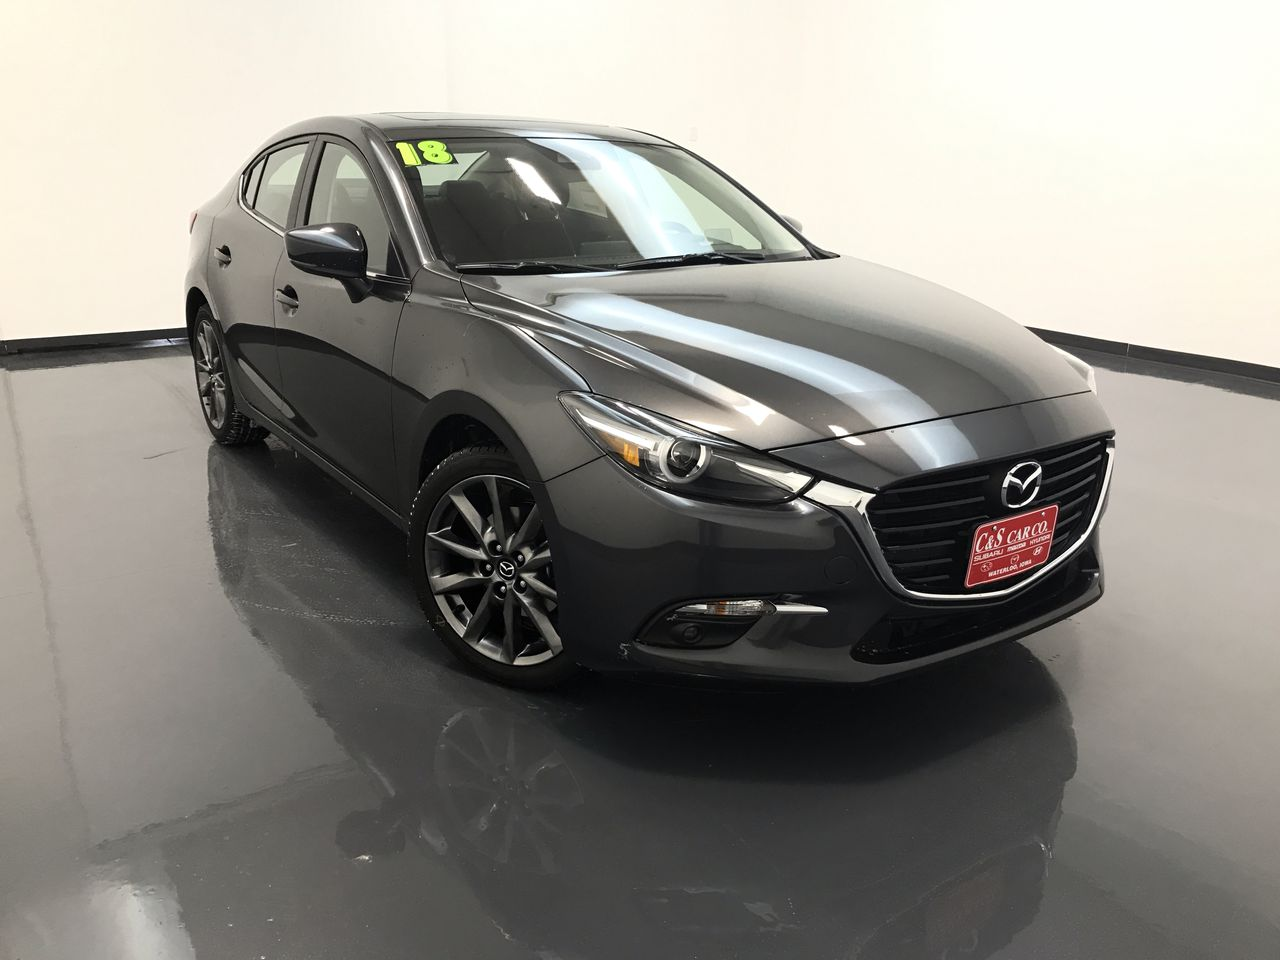 Thumbnail 2018 Mazda Mazda3 4 Door C S Car Company